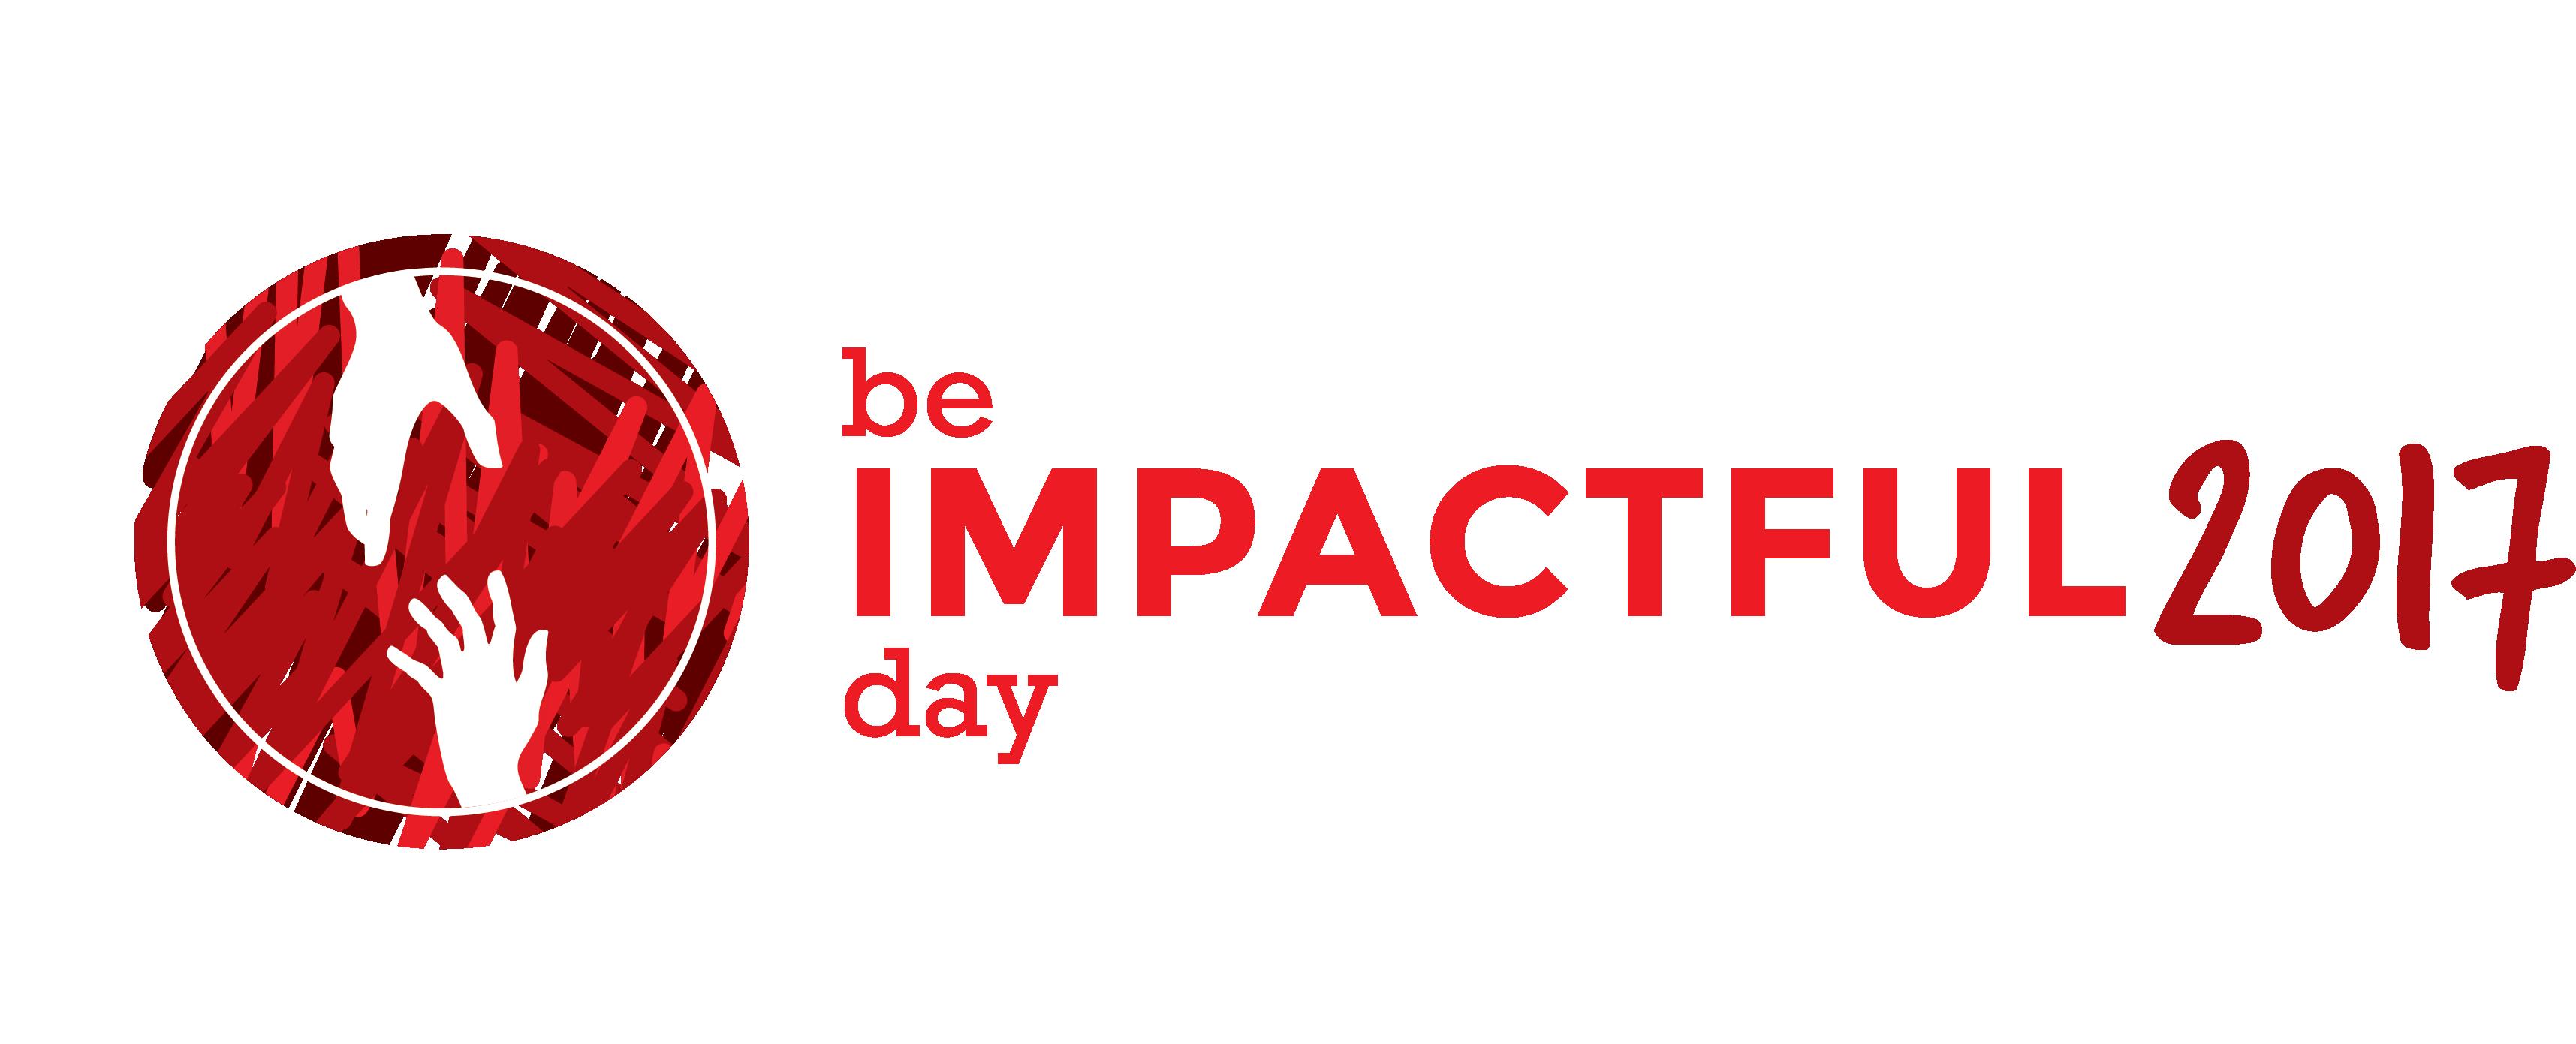 Be Impactful Day™